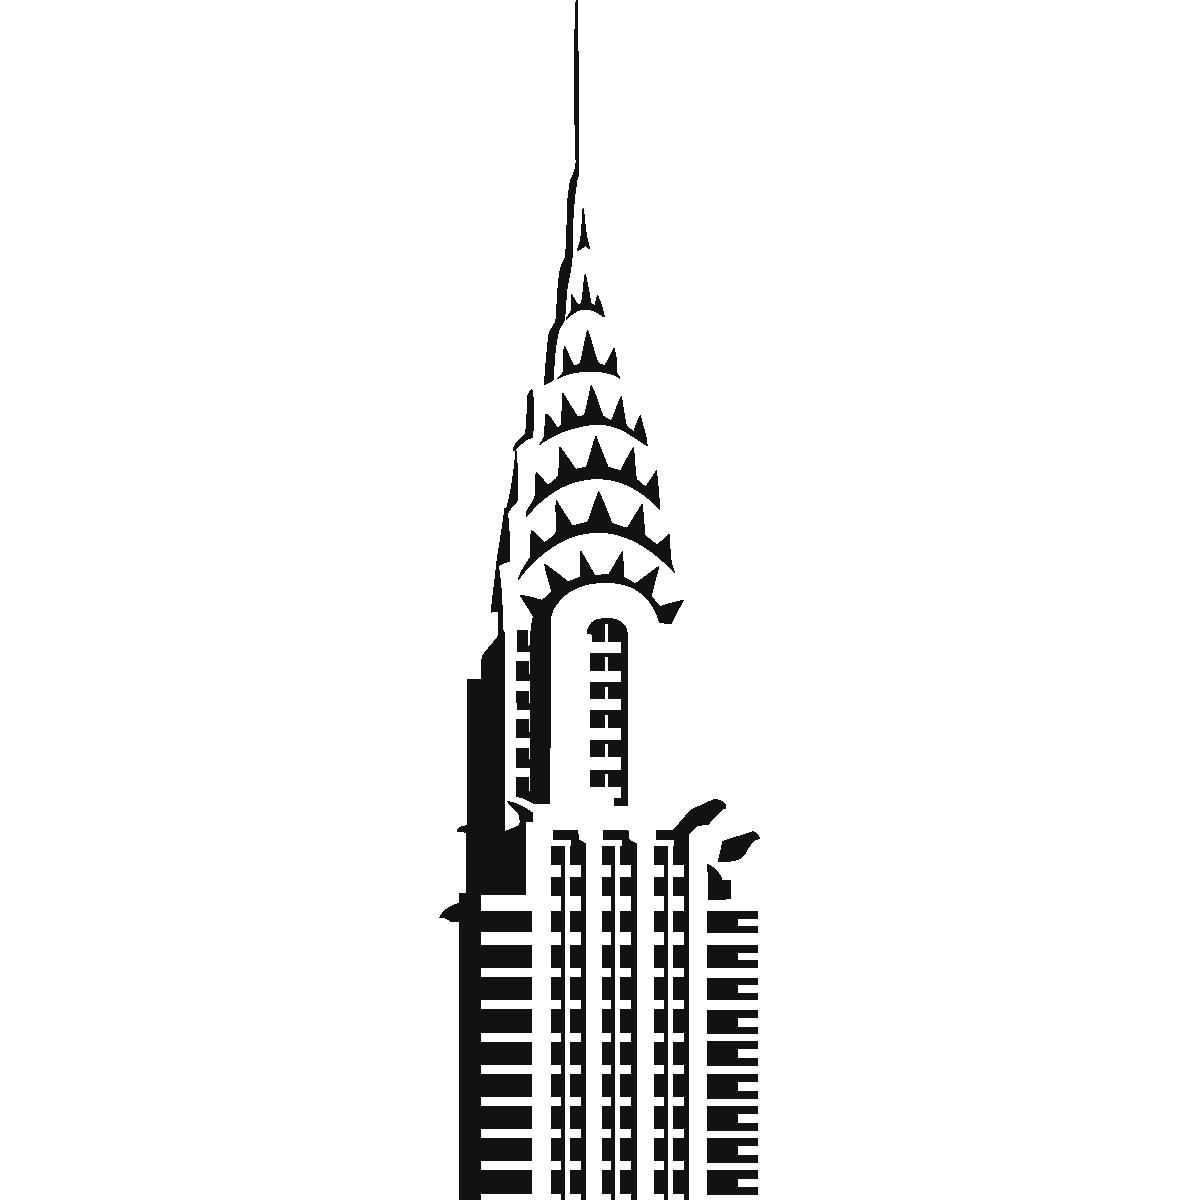 1200x1200 Chrysler Building Drawing